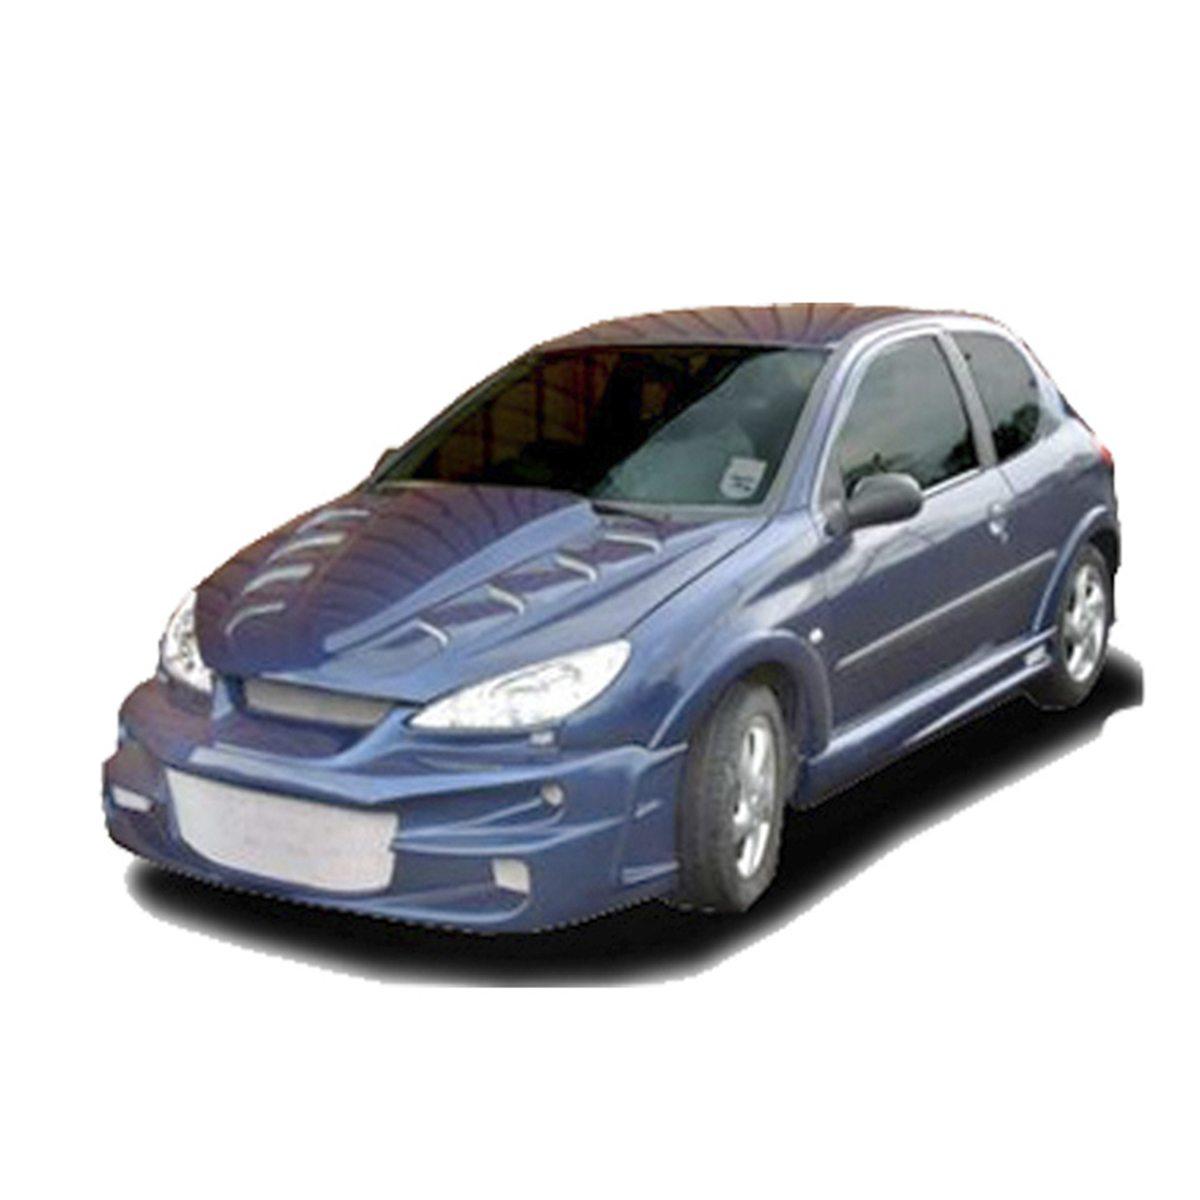 Peugeot-206-BadBoy-Frt-PCA080